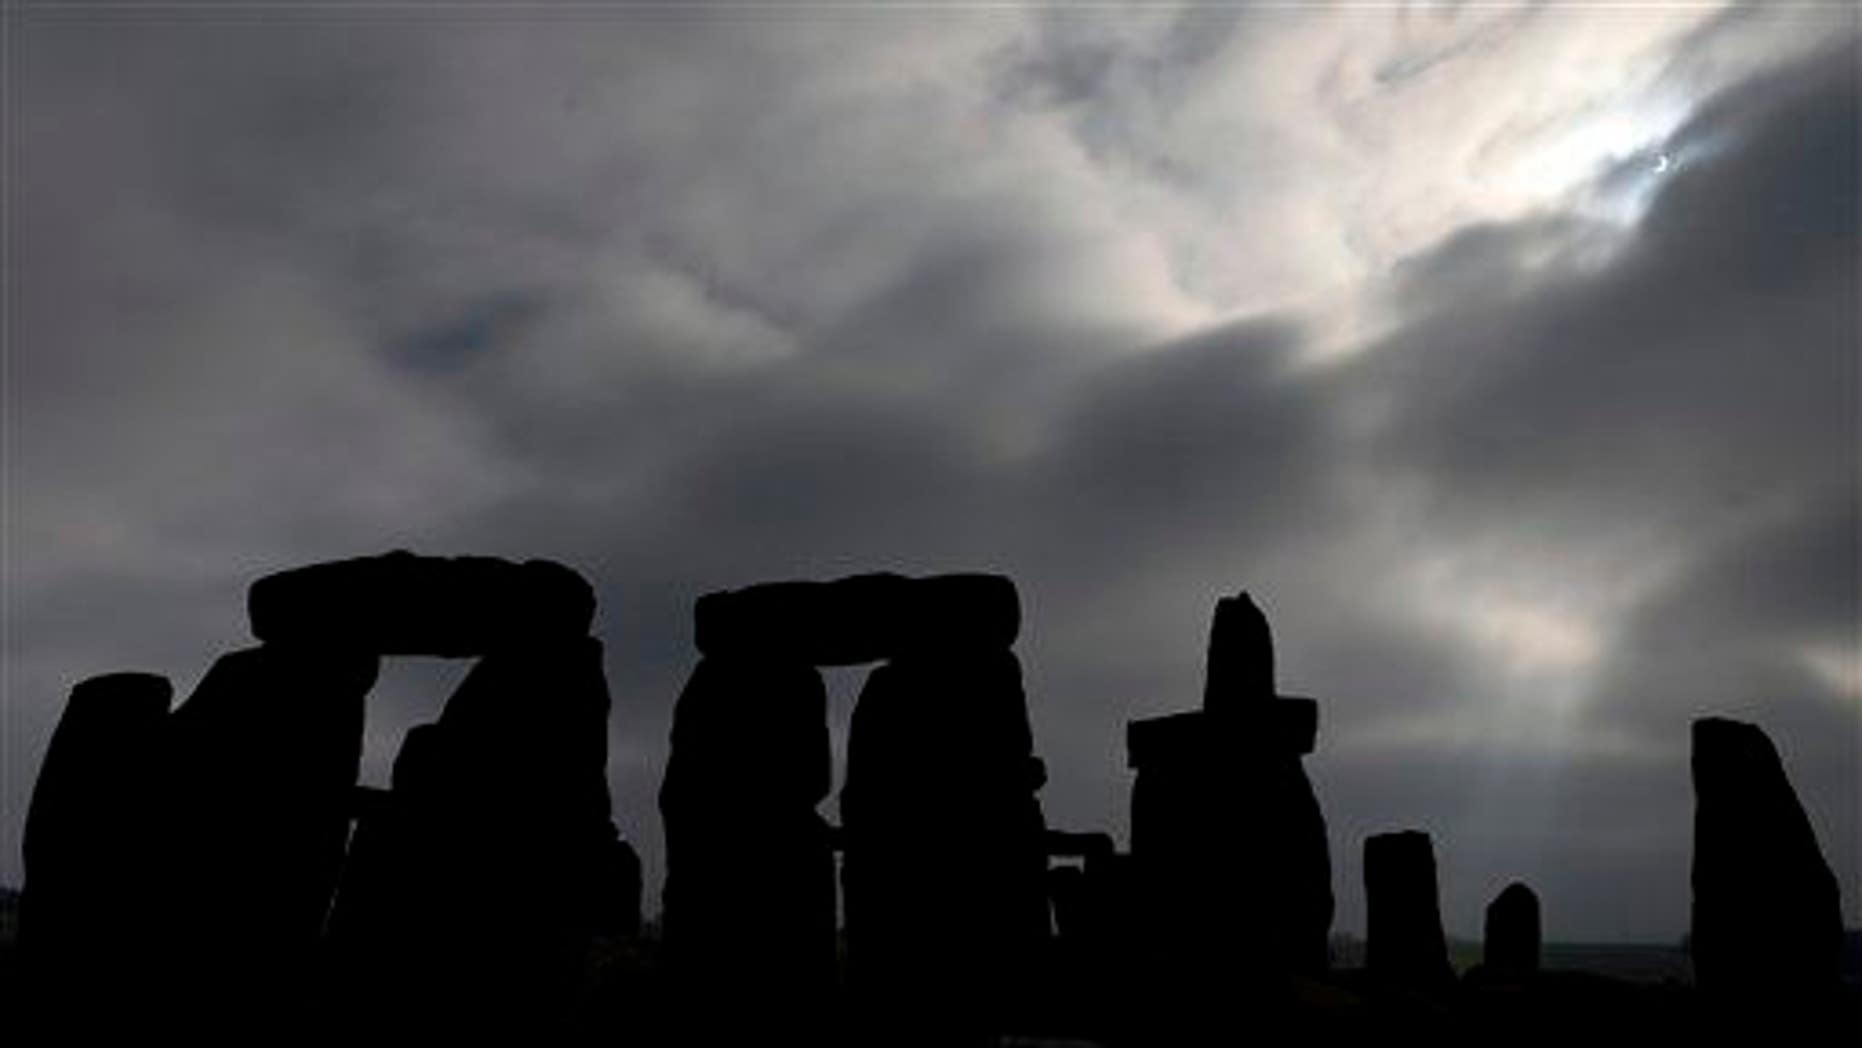 Stonehenge, Salisbury Plain, England is shown on Friday March 20, 2015.